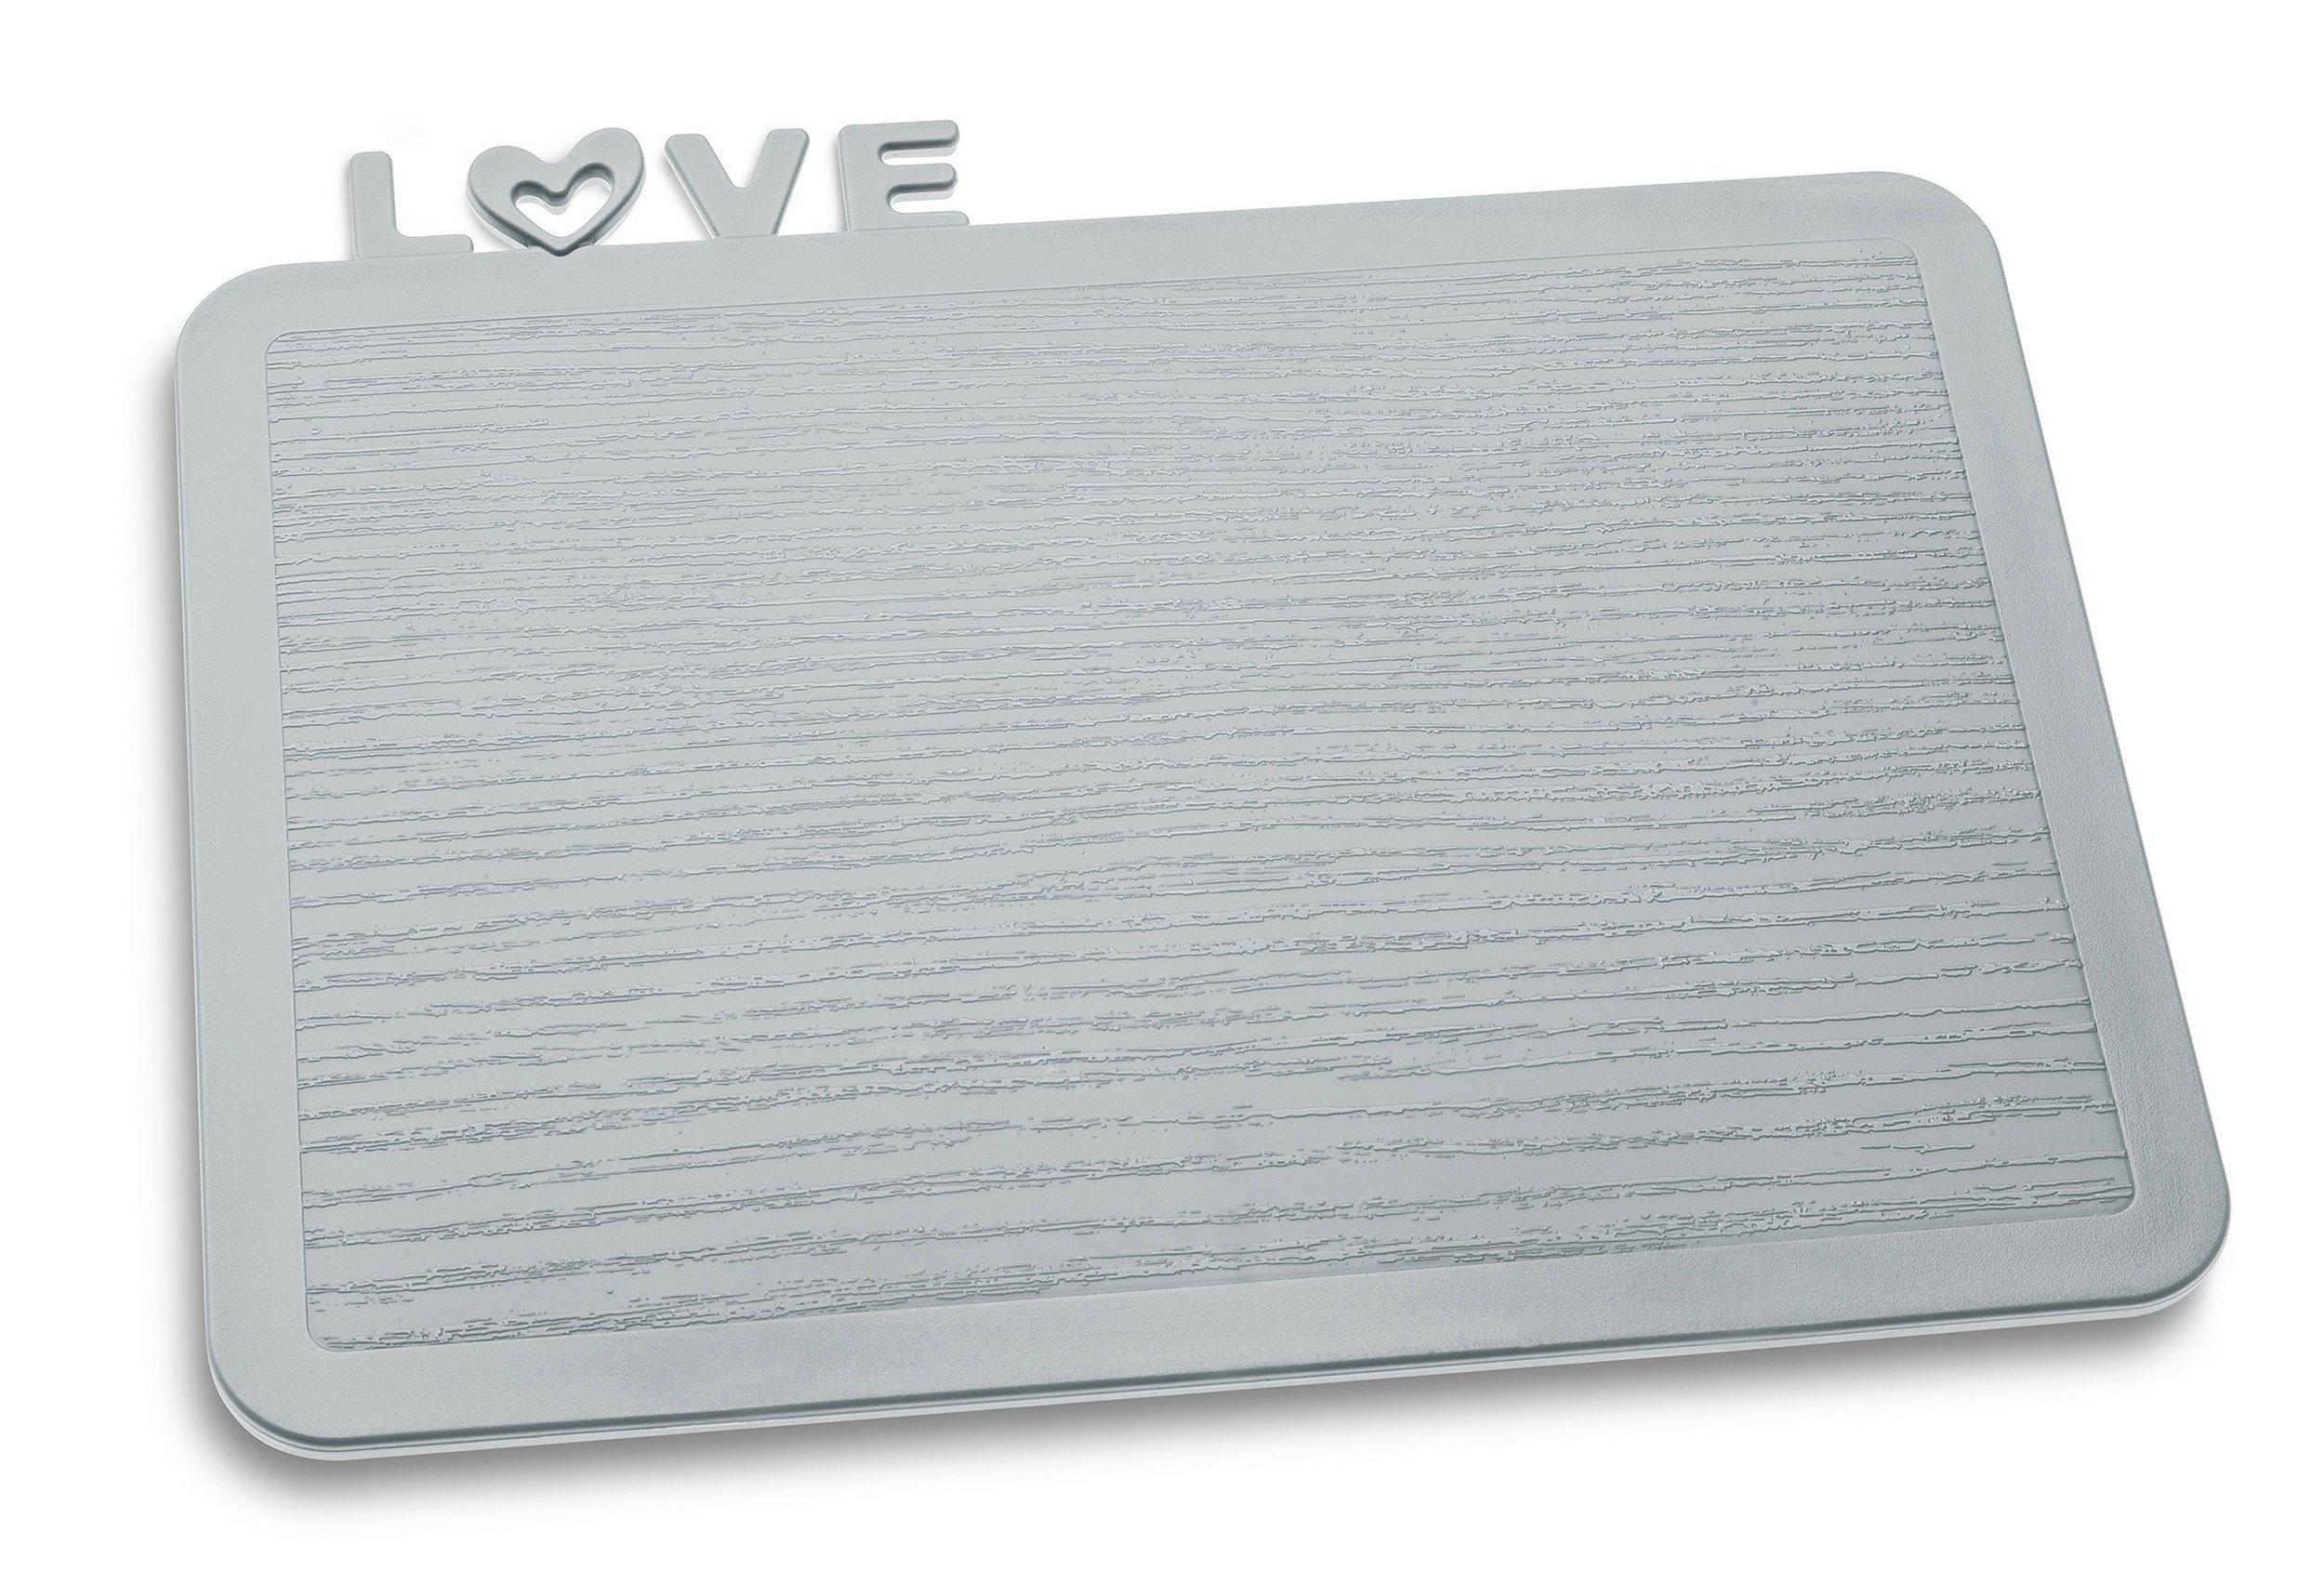 Deska śniadaniowa Happy Boards Love szara